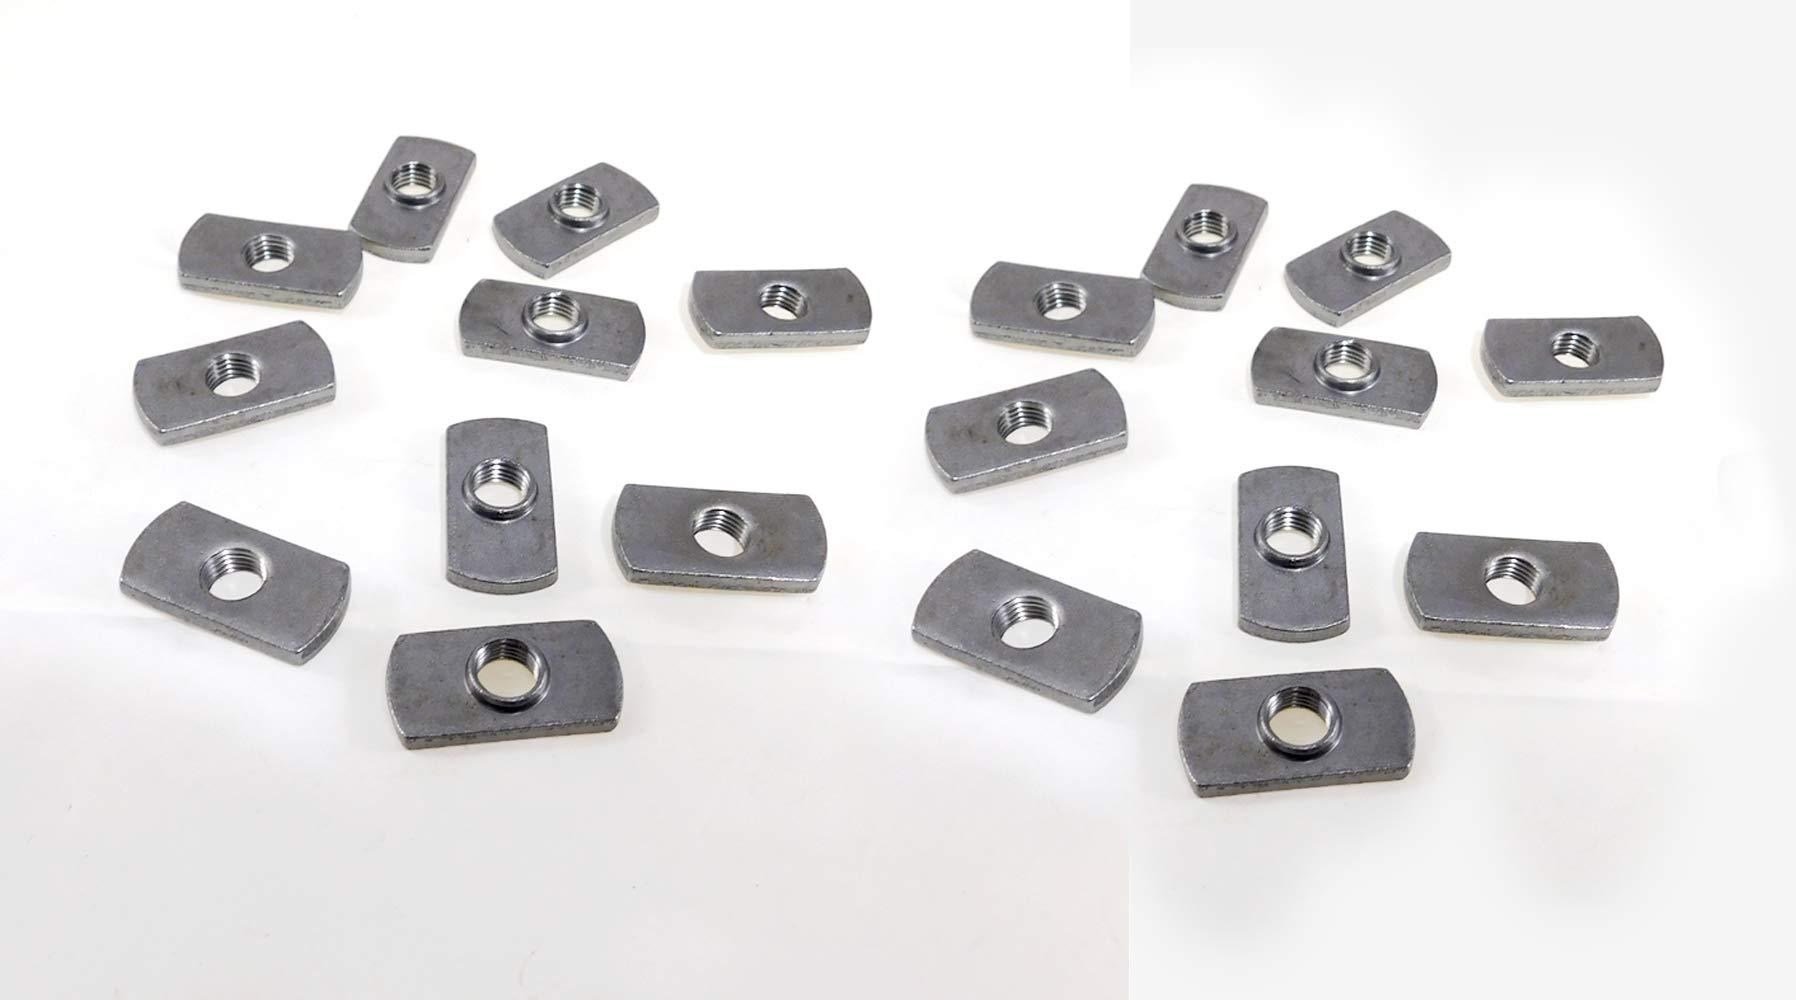 20 Pack 7/16-20 Spot Weld Nuts - Double Tab - ND 3924 by Buckeye Fastener